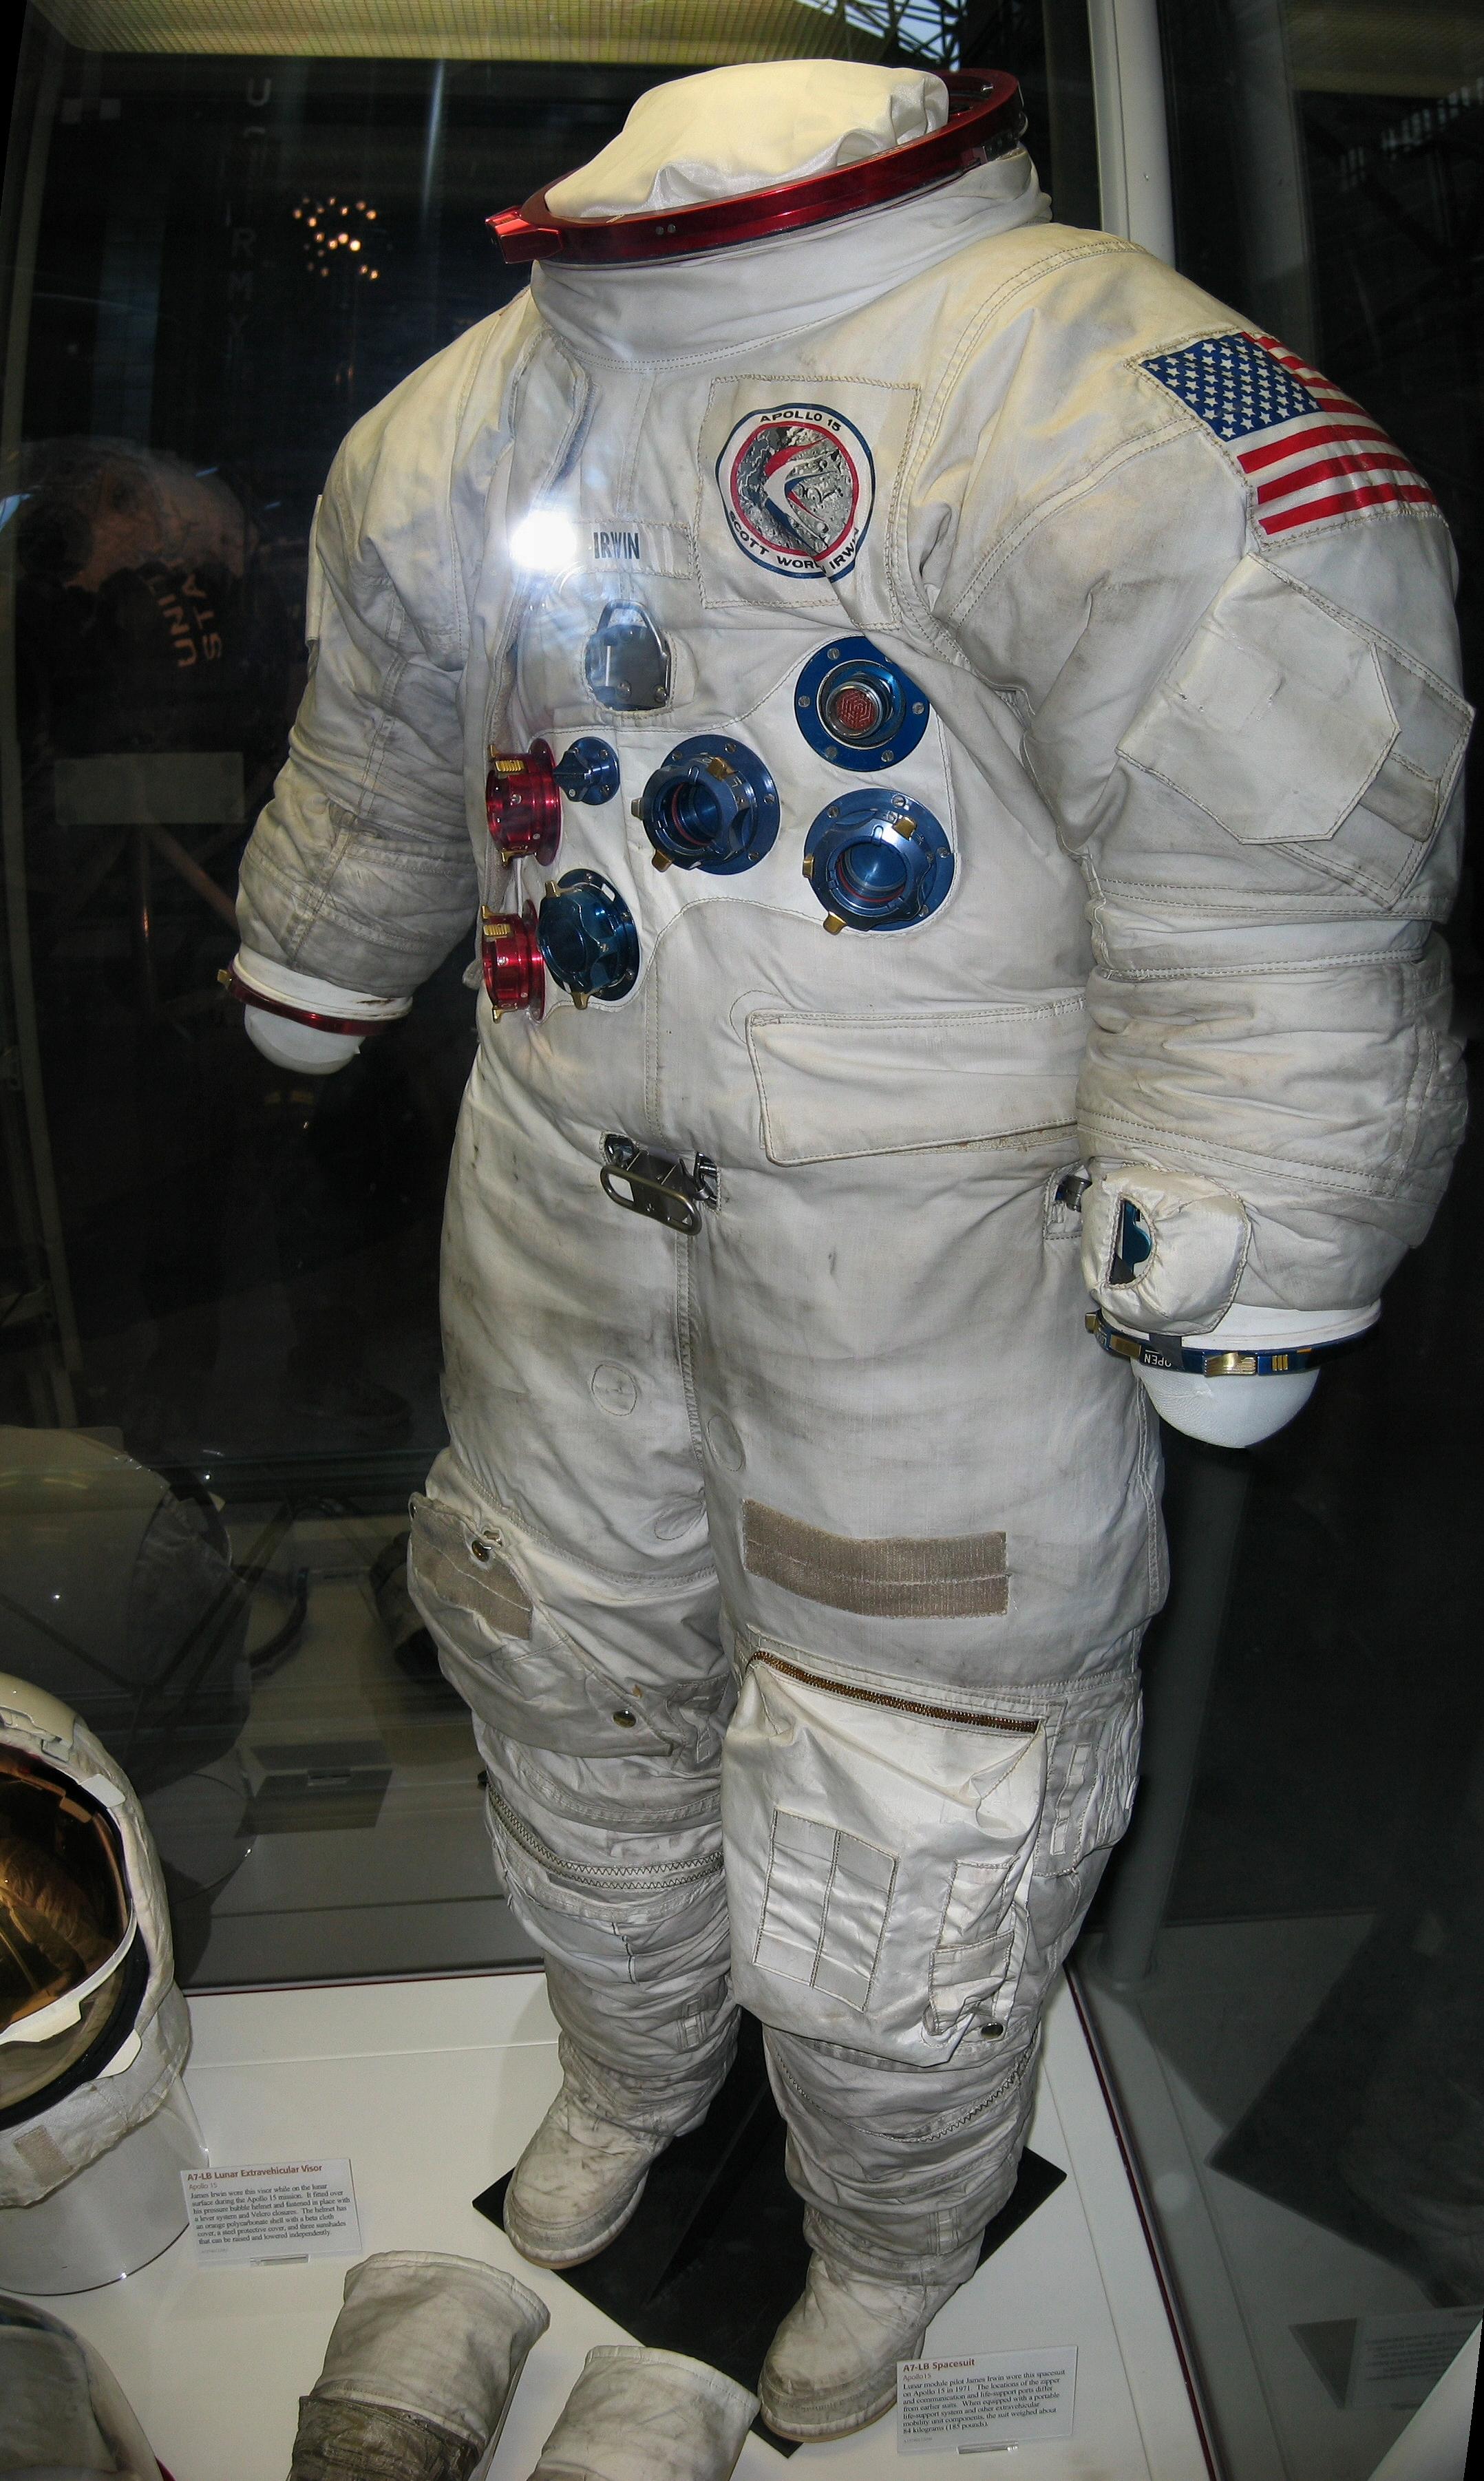 apollo 13 space suit - photo #4